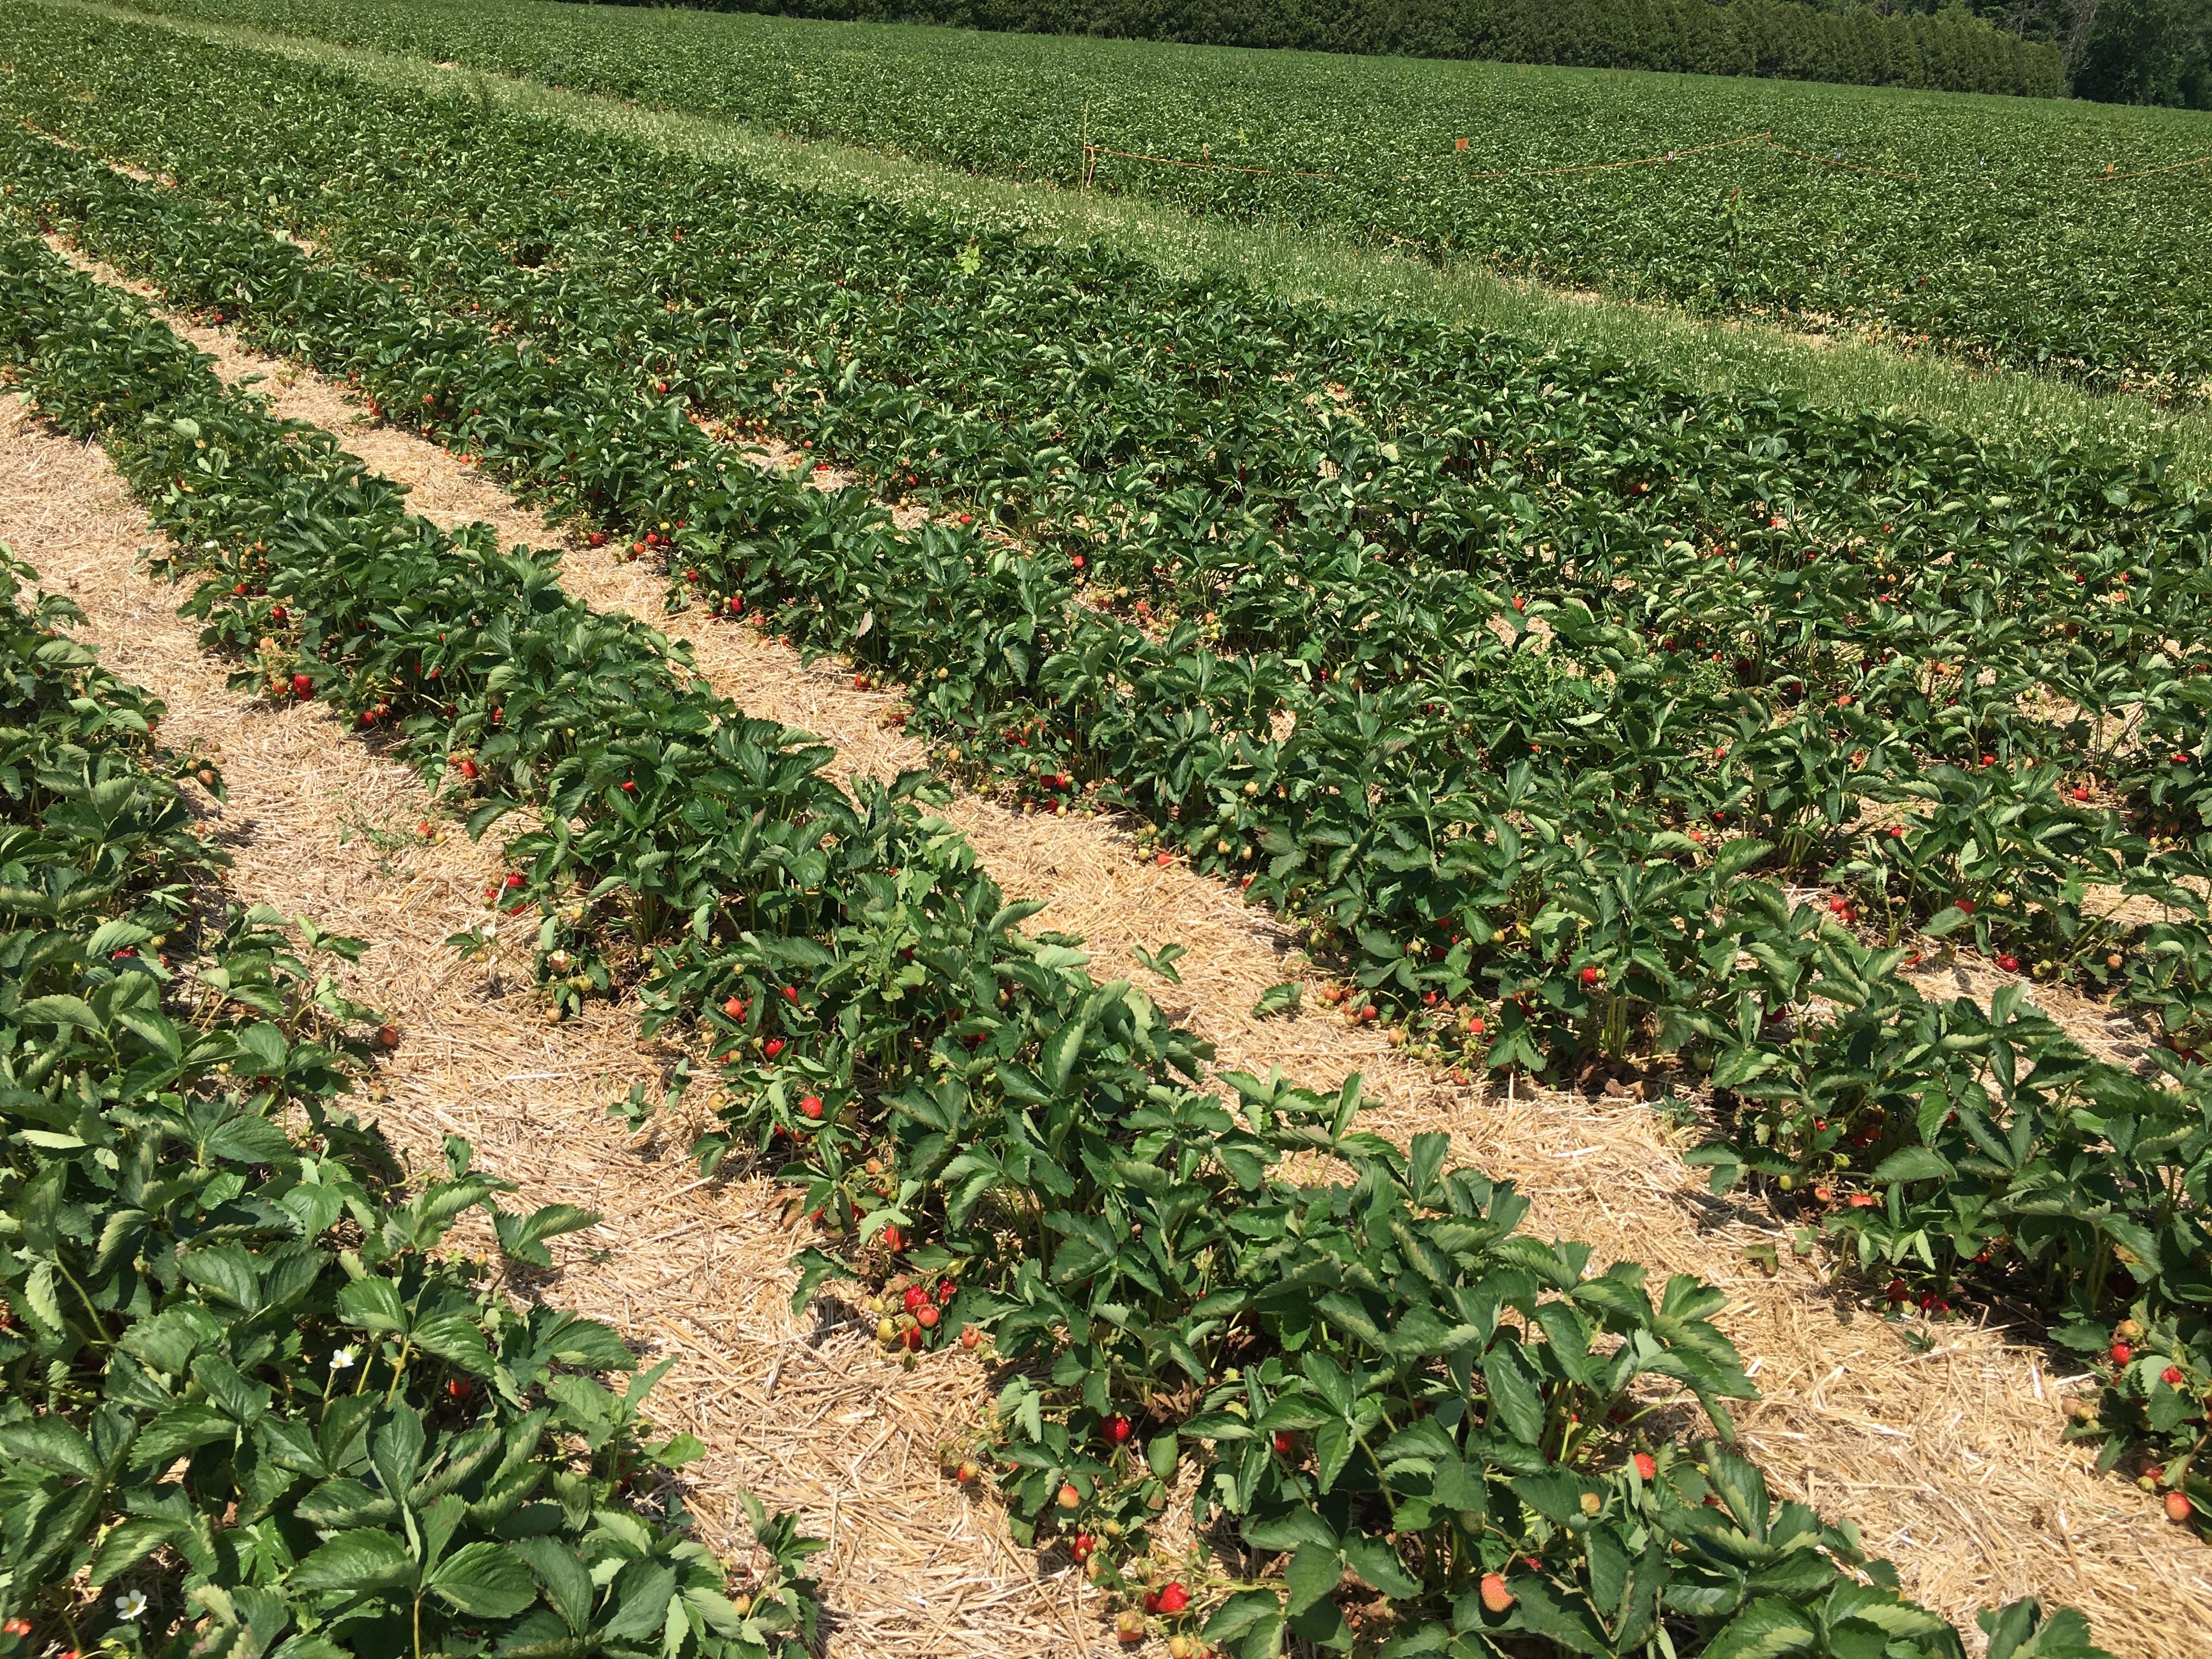 June-bearing strawberry field